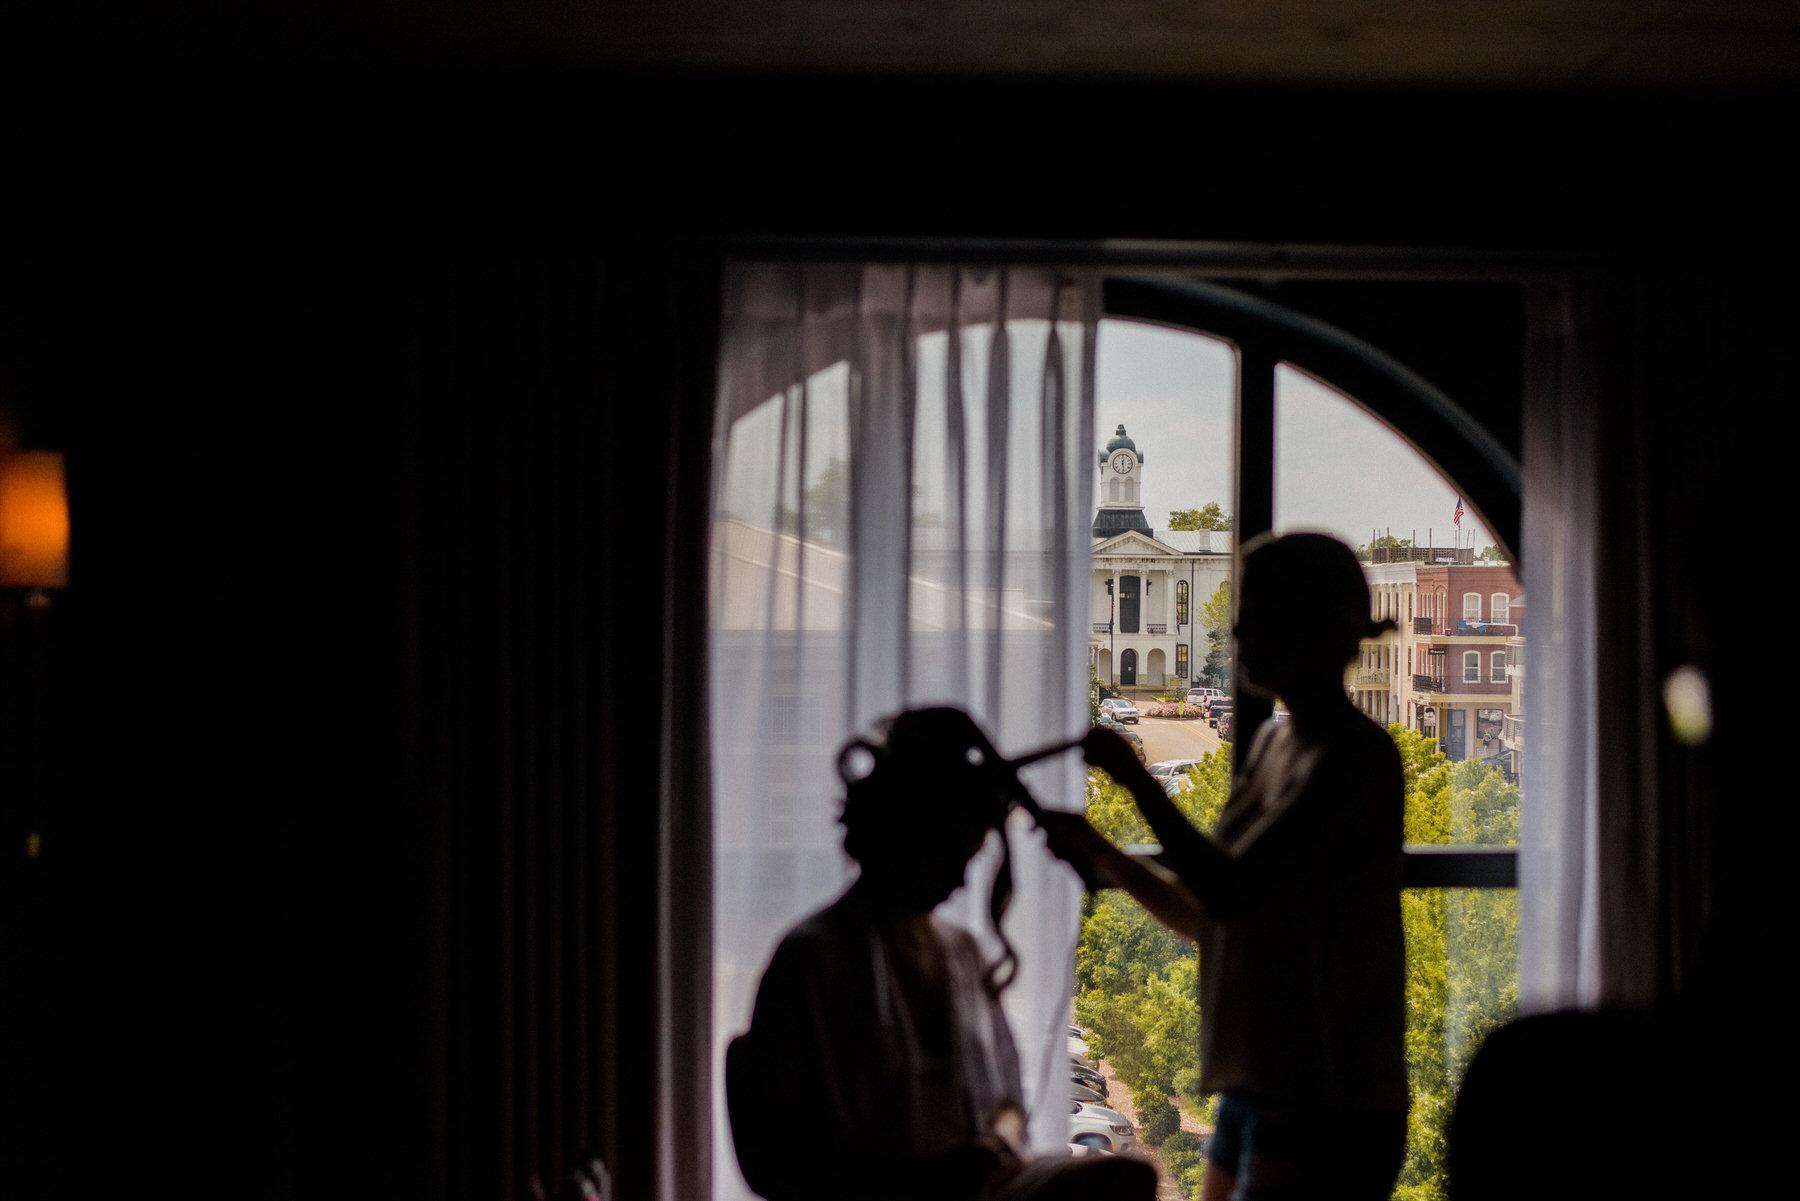 Oxford_mississippi_wedding_photographer_002.jpg